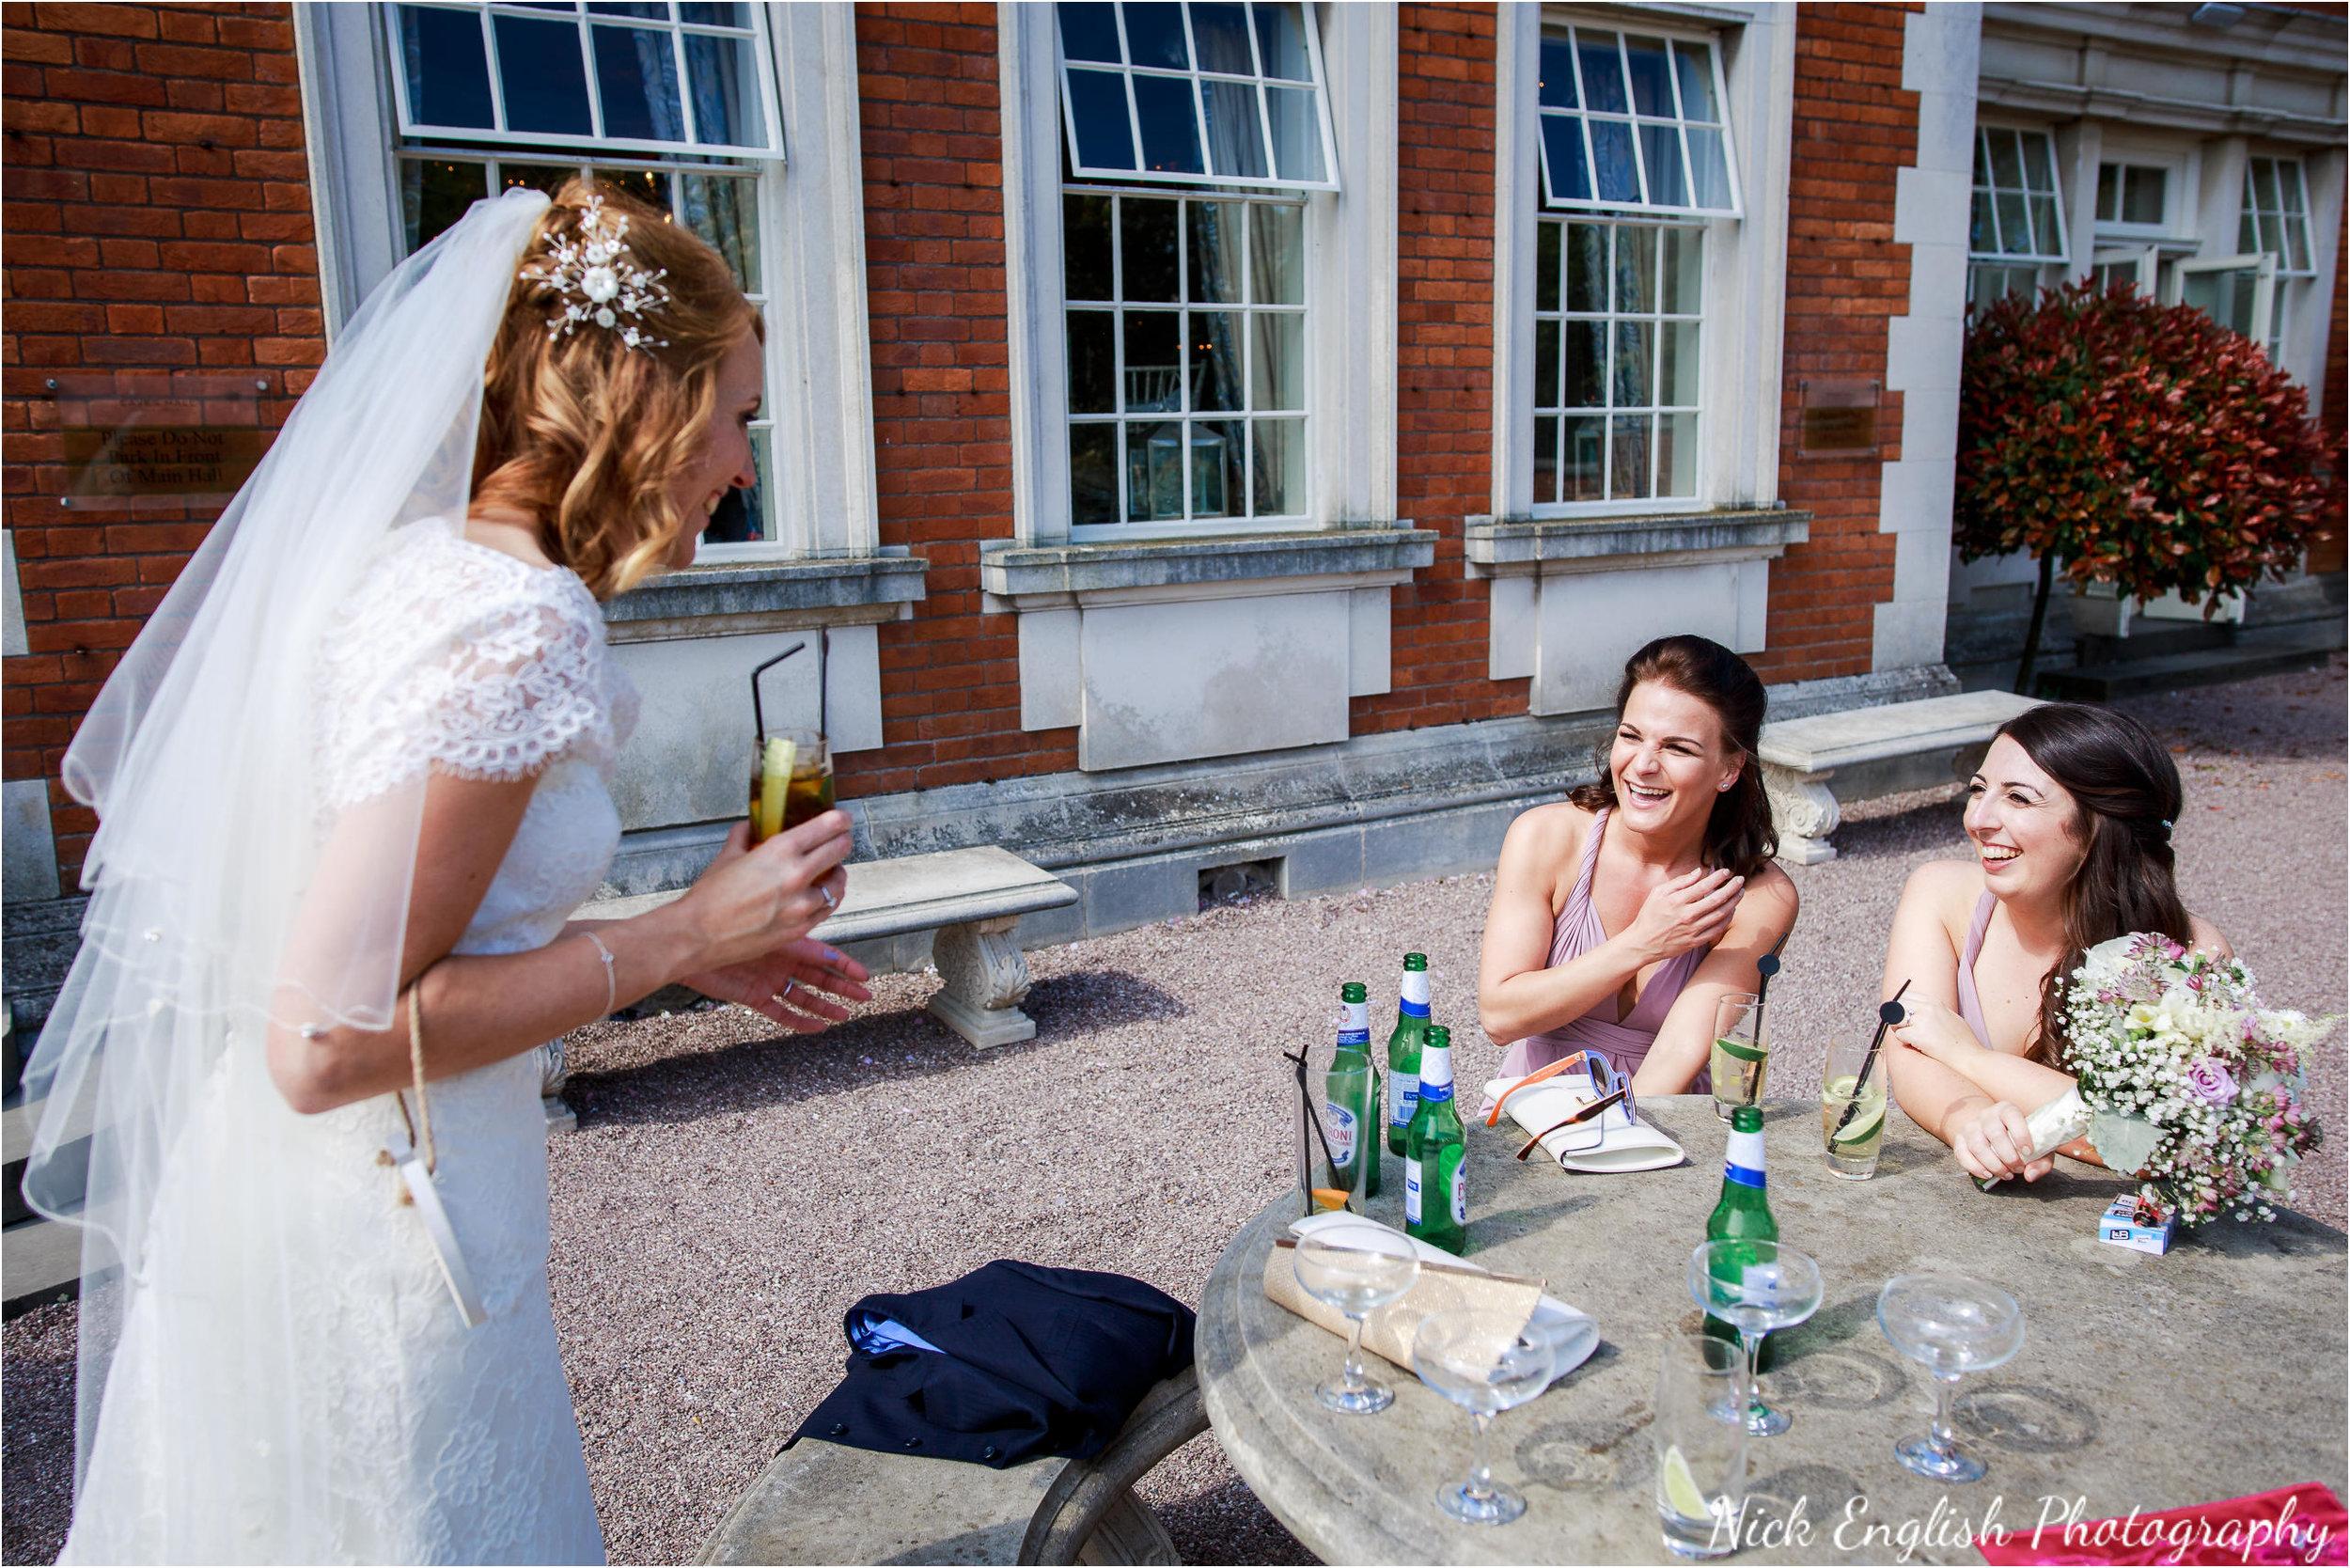 Alison James Wedding Photographs at Eaves Hall West Bradford 146jpg.jpeg